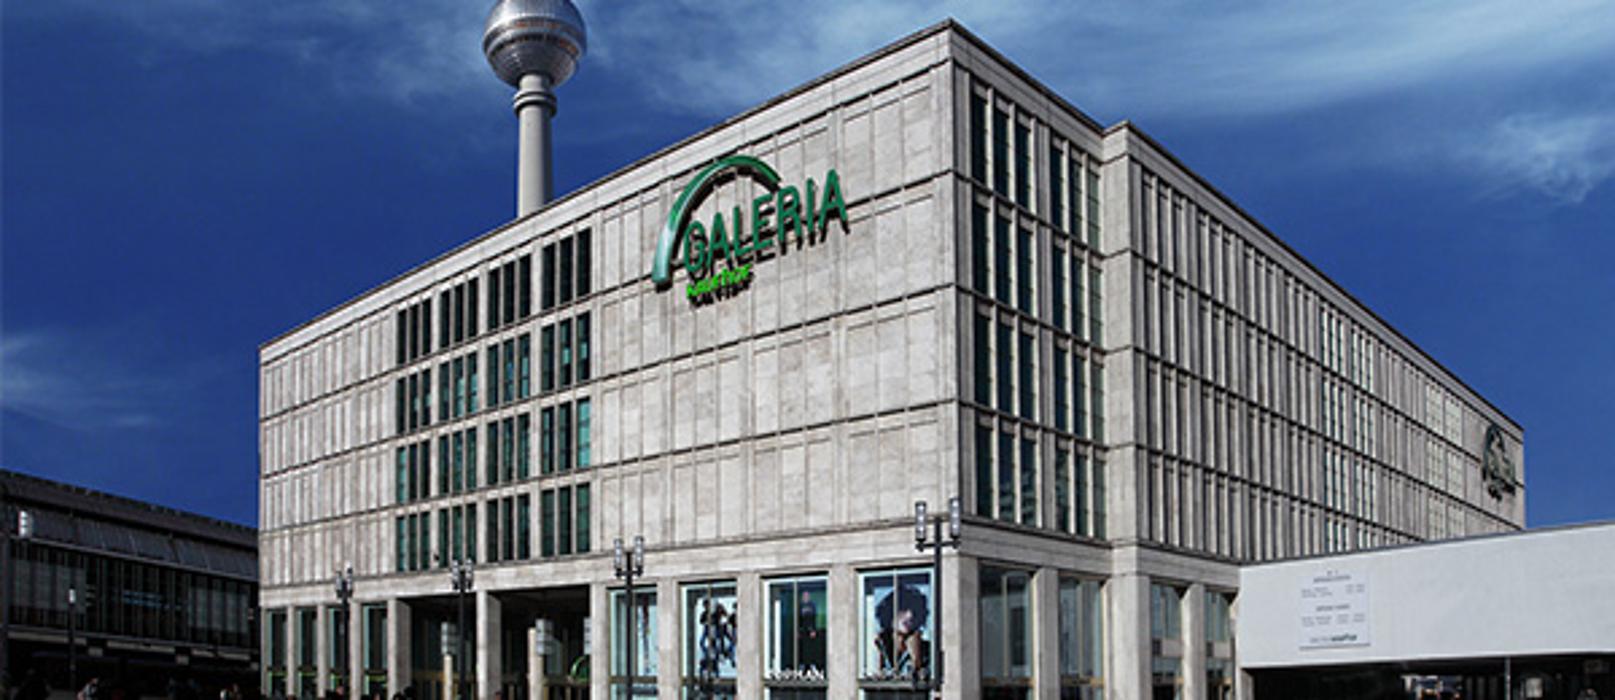 GALERIA (Kaufhof) Berlin Alexanderplatz, Alexanderplatz in Berlin